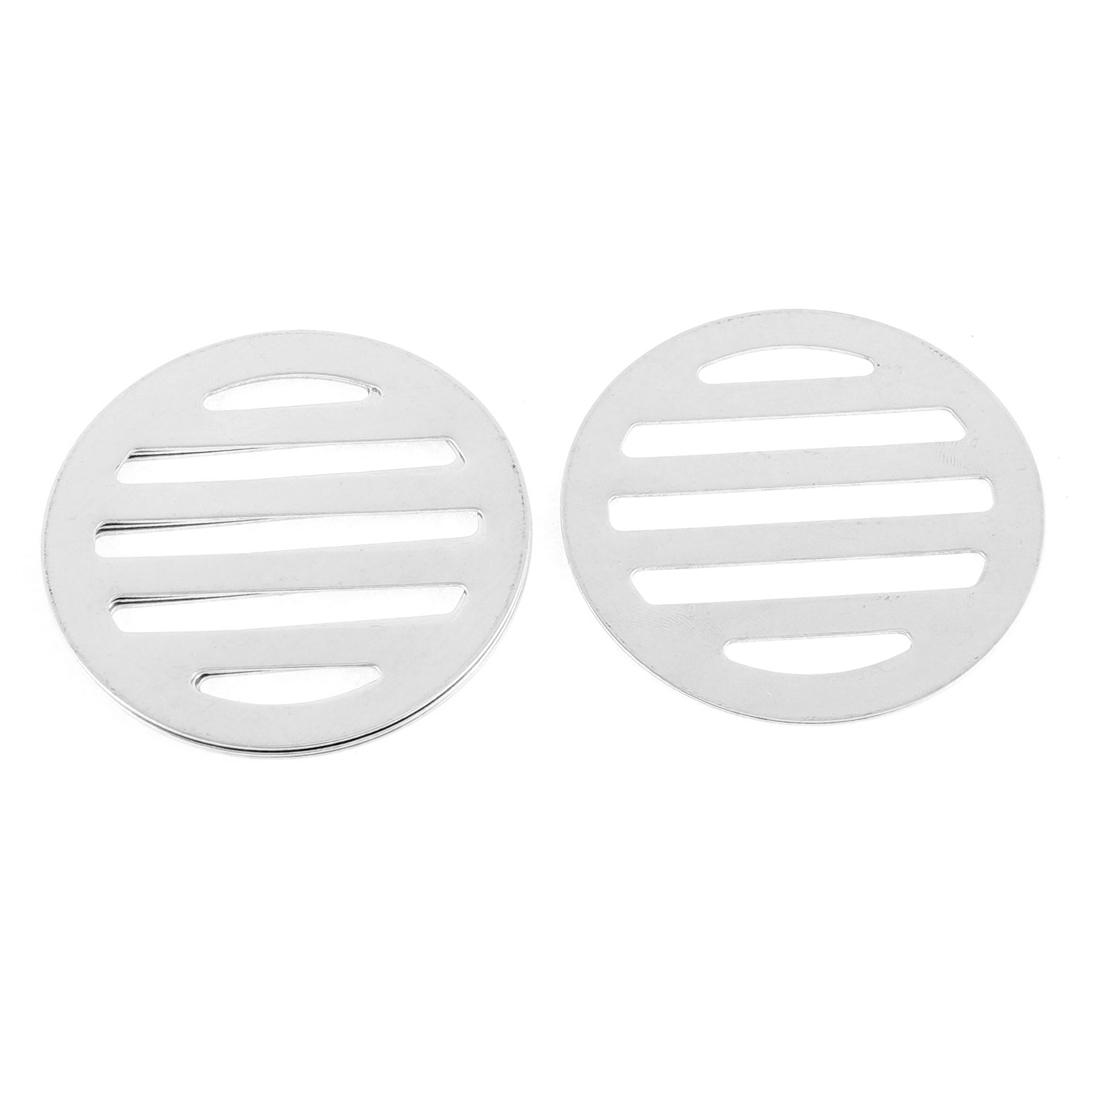 "Stainless Steel Kitchen Bathroom Round Floor Drain Cover 2.4"" 6.2cm 4Pcs"